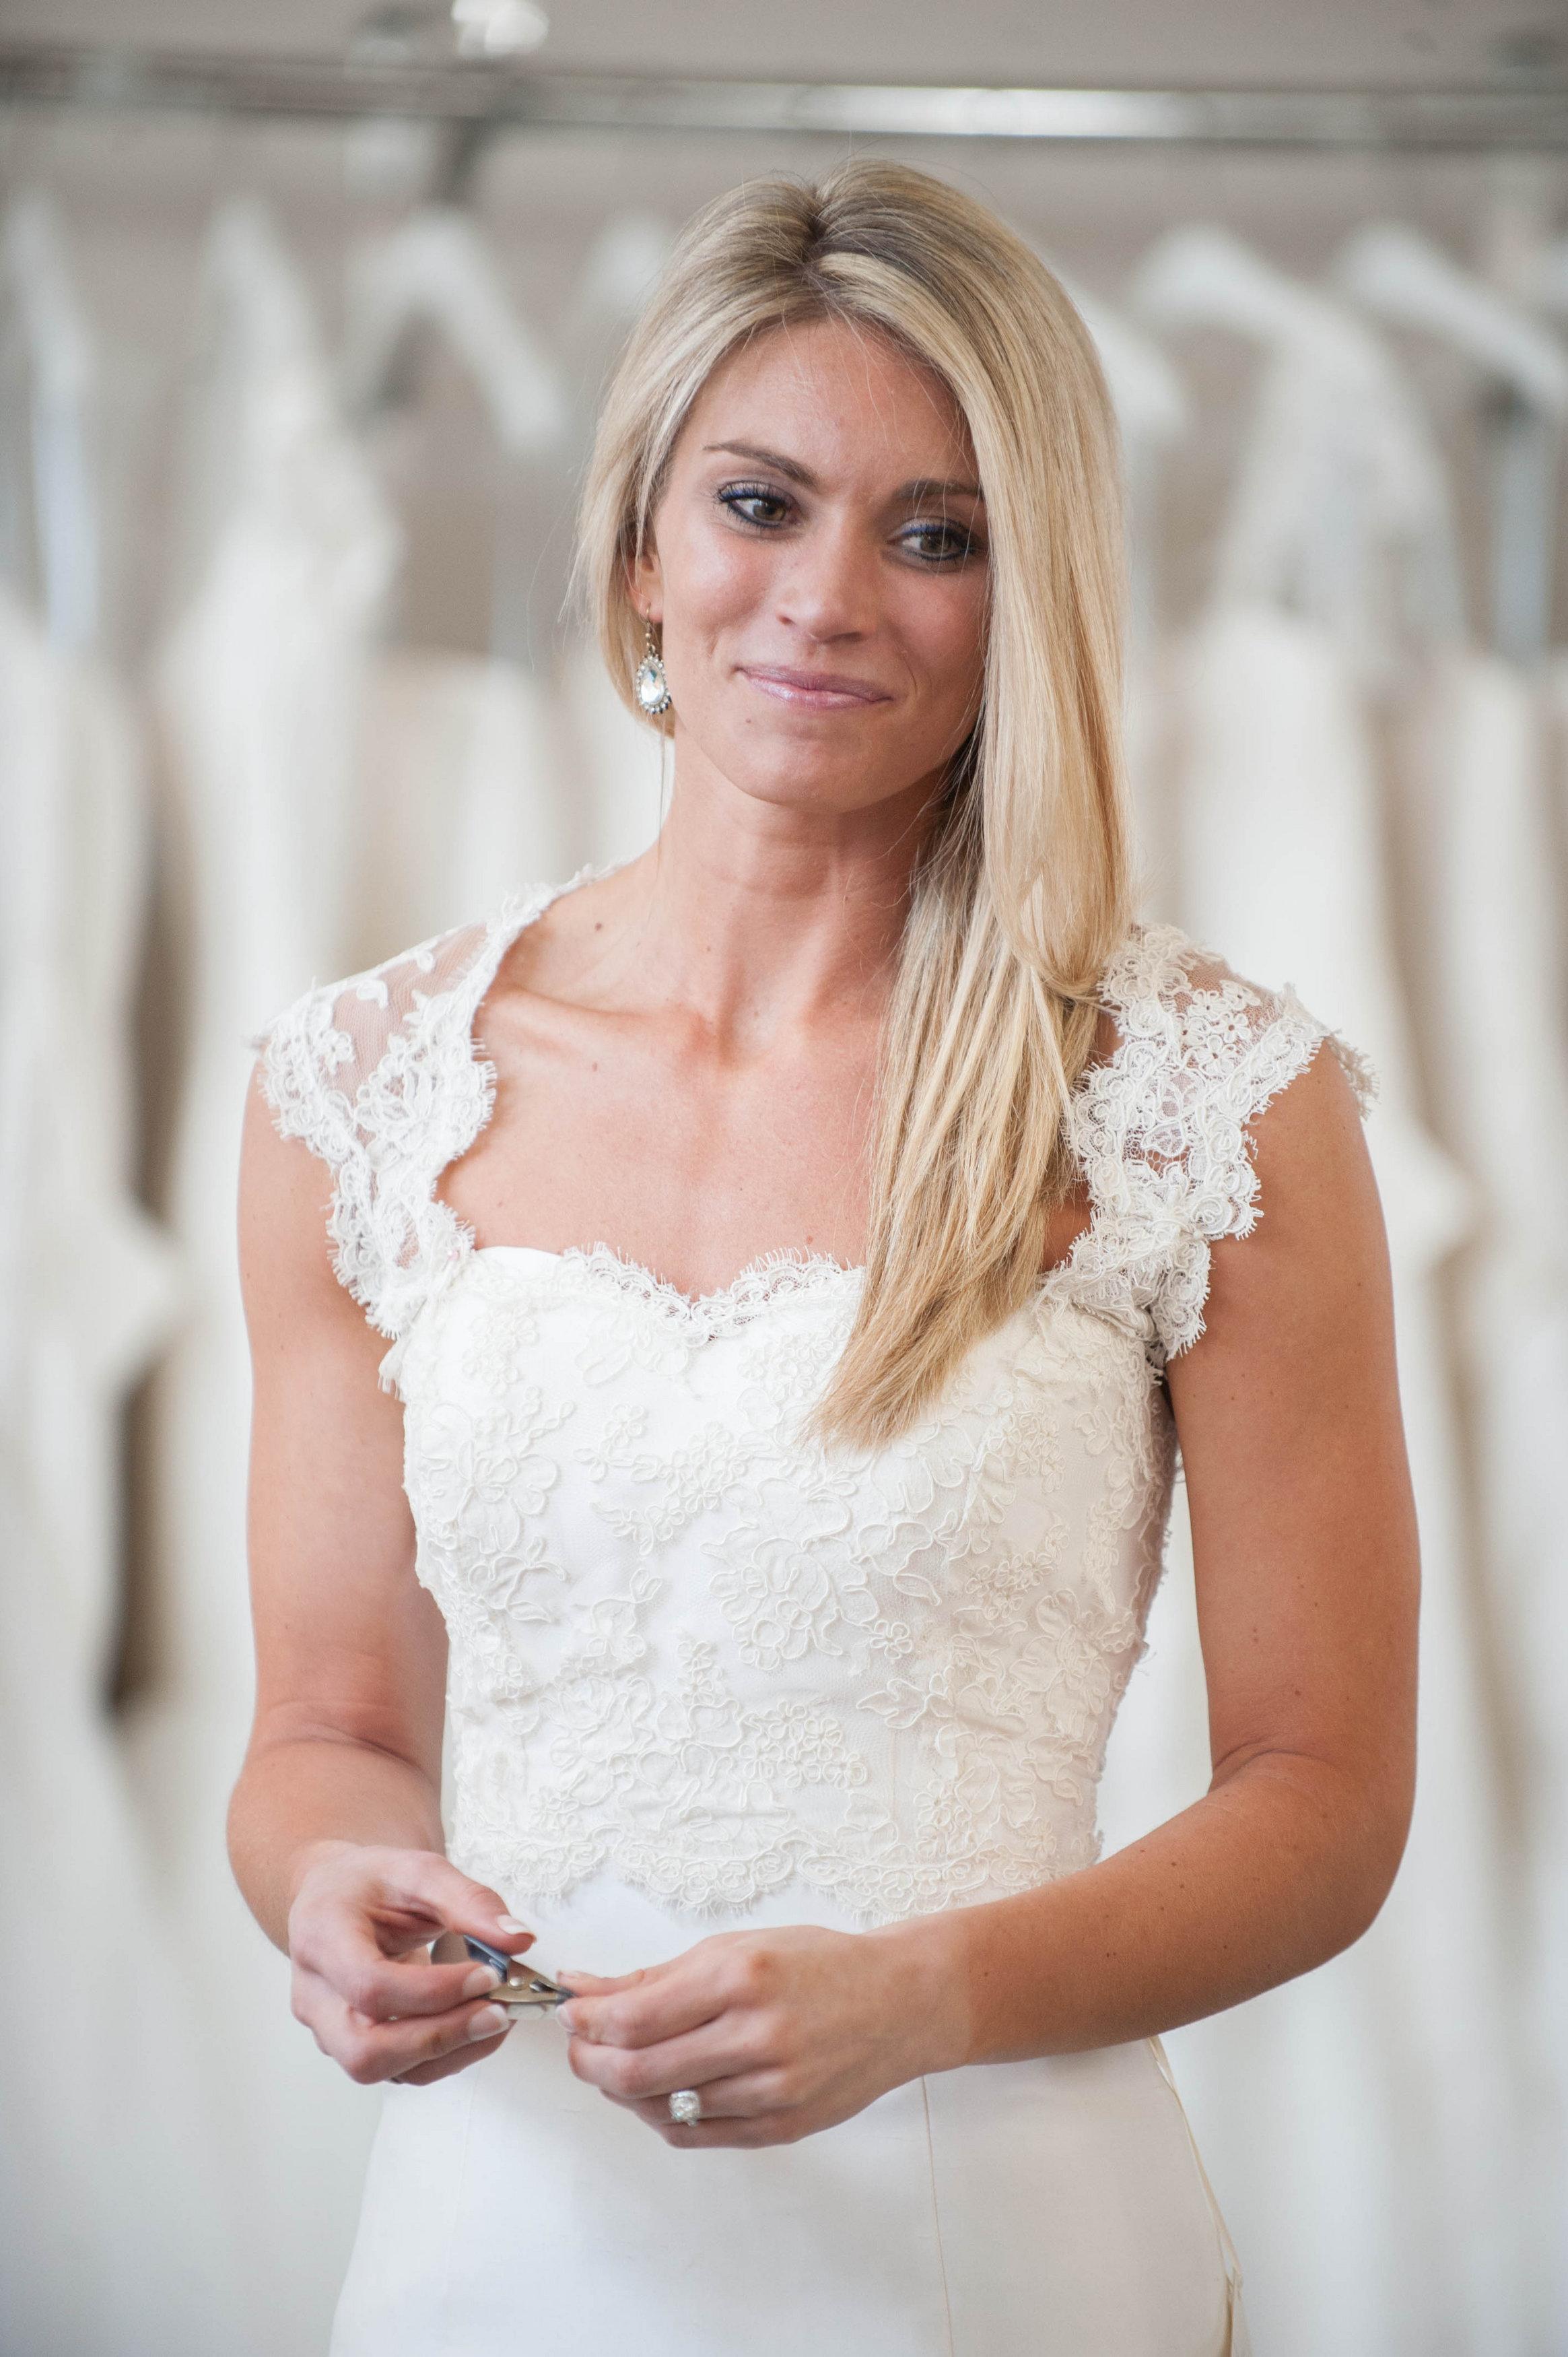 Interview with Heidi Elnora Project Runway Alum & TLC Star of Bride ...